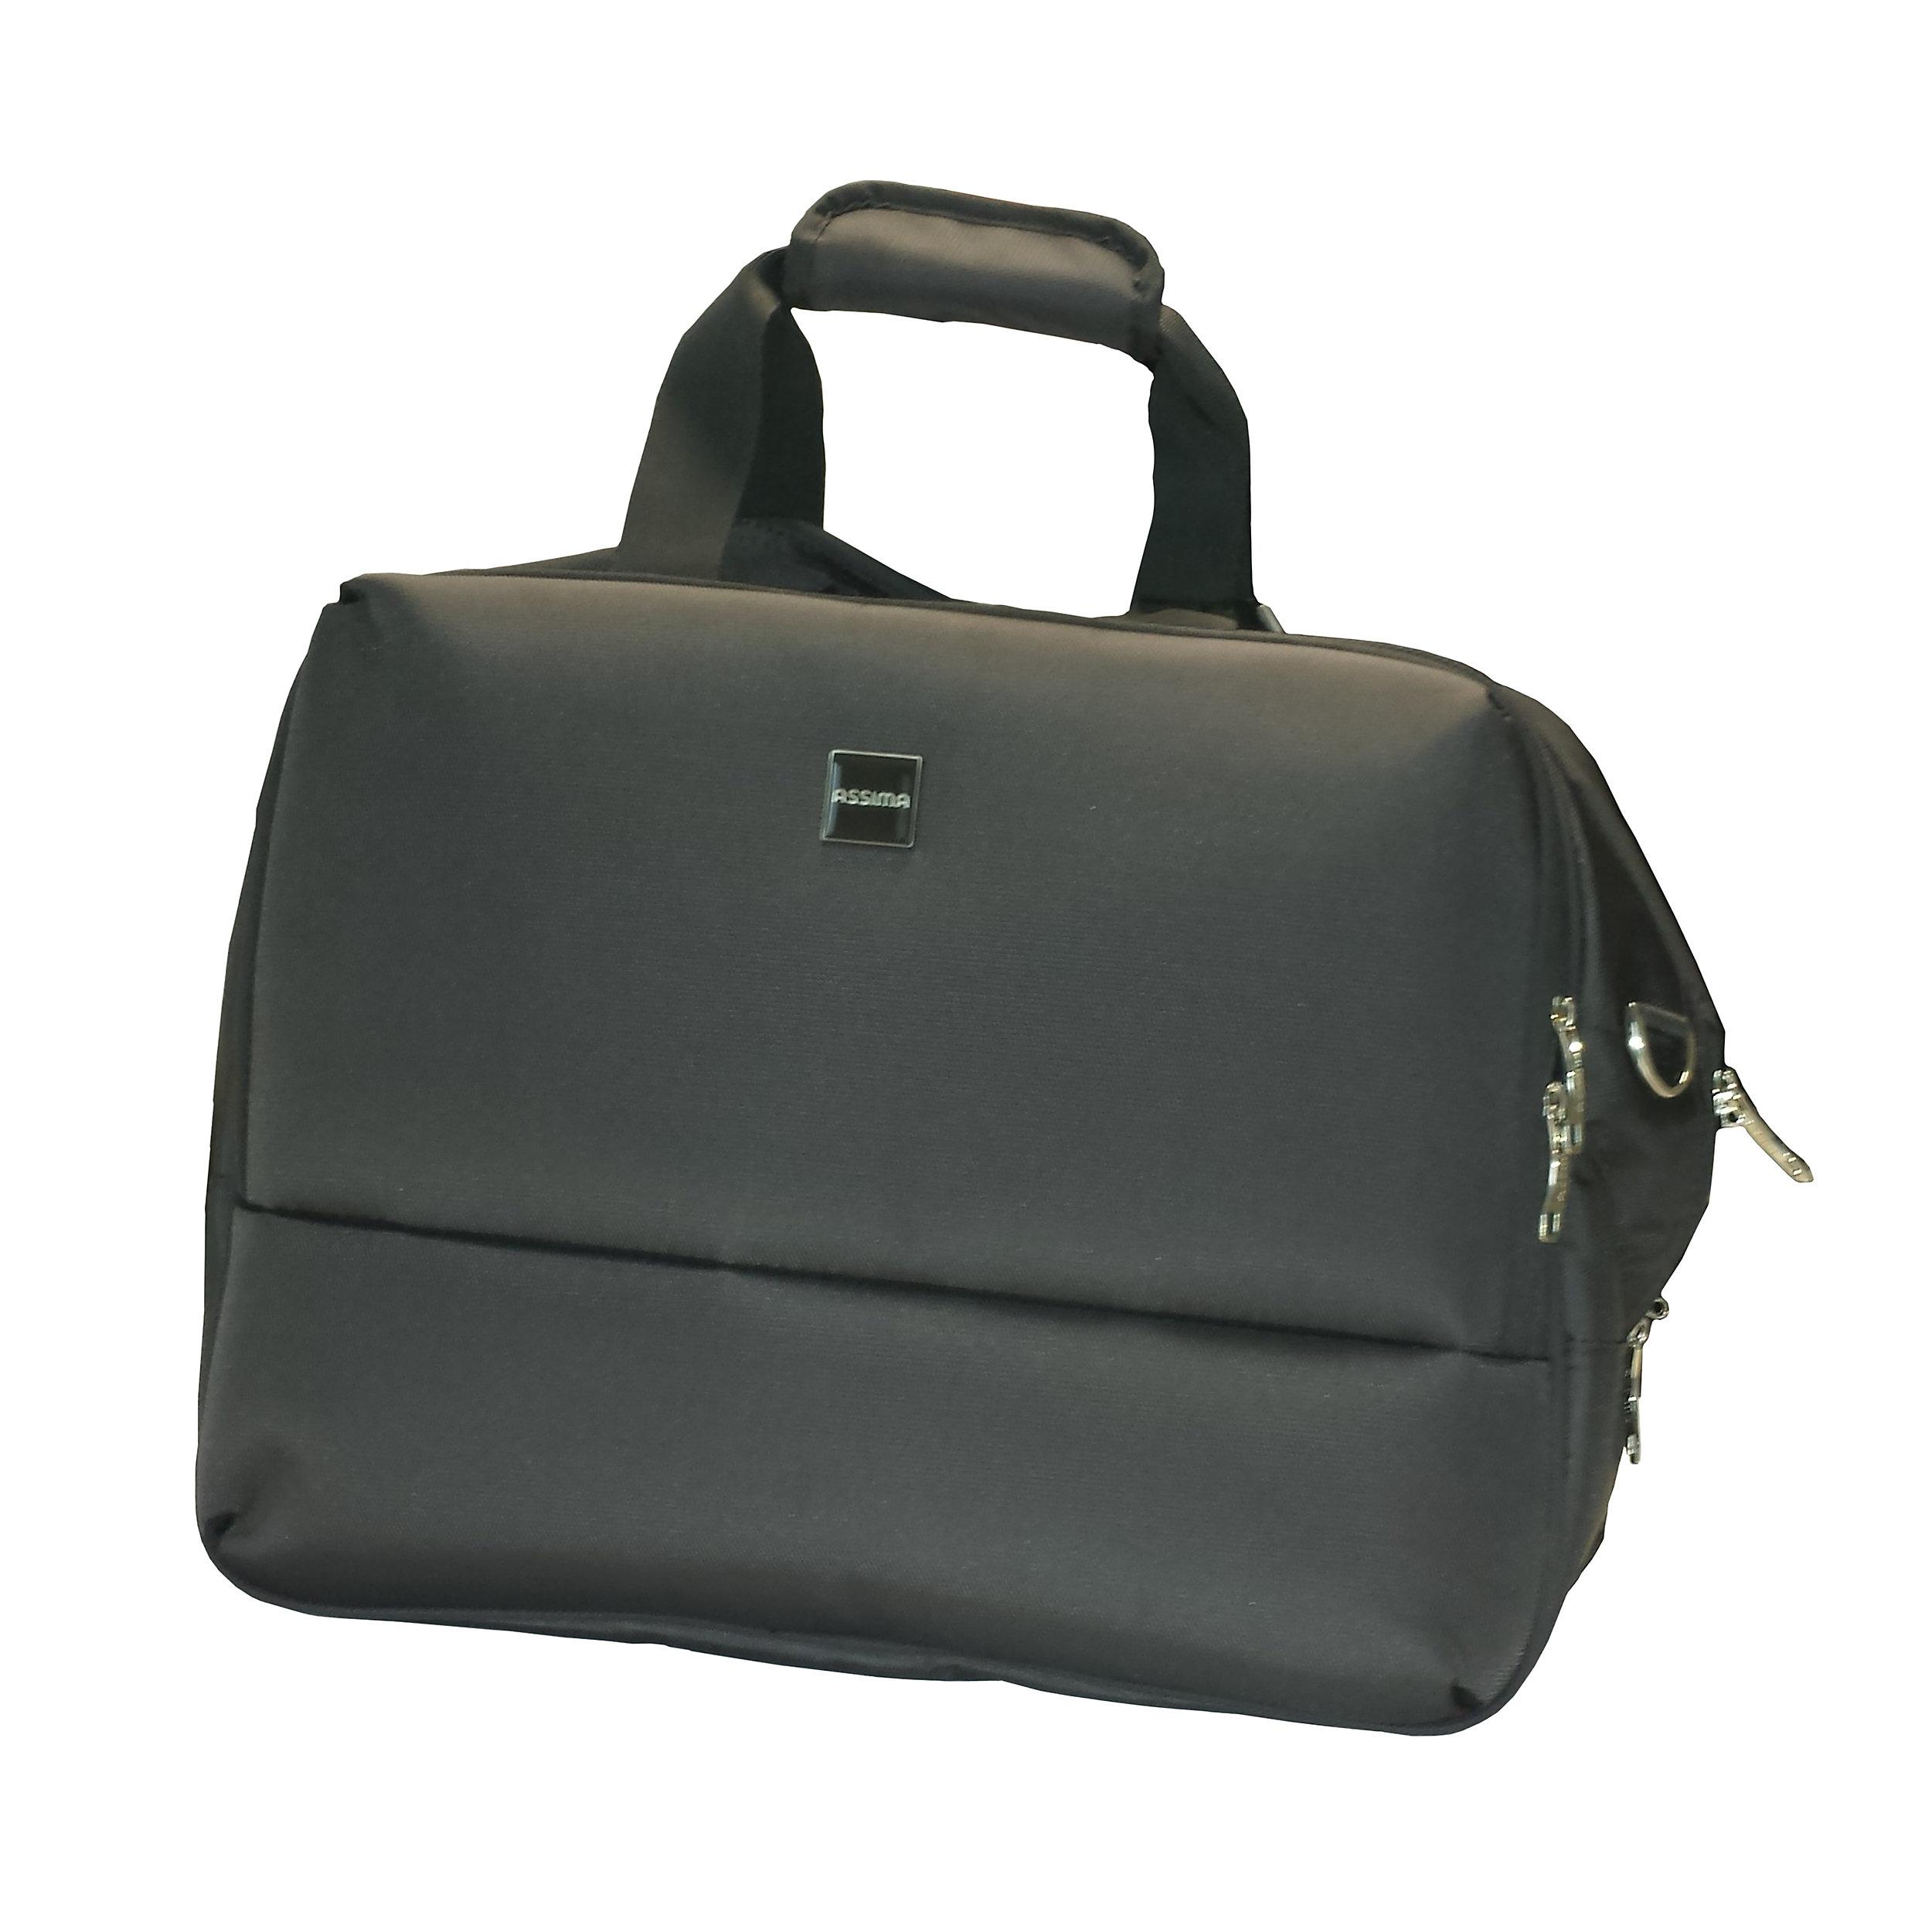 Reisetasche Loubs Softair 27 Liter